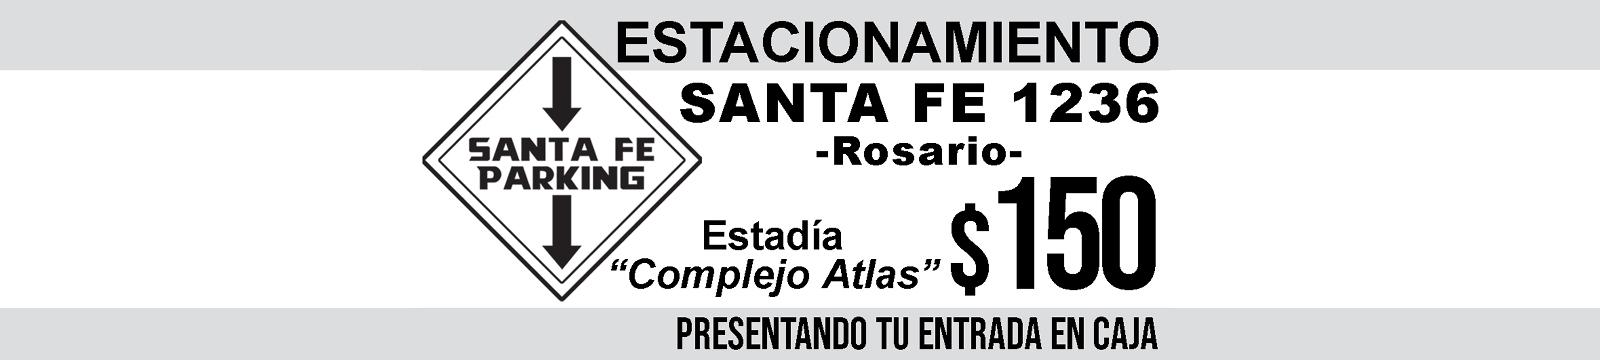 Santa Fe Parking